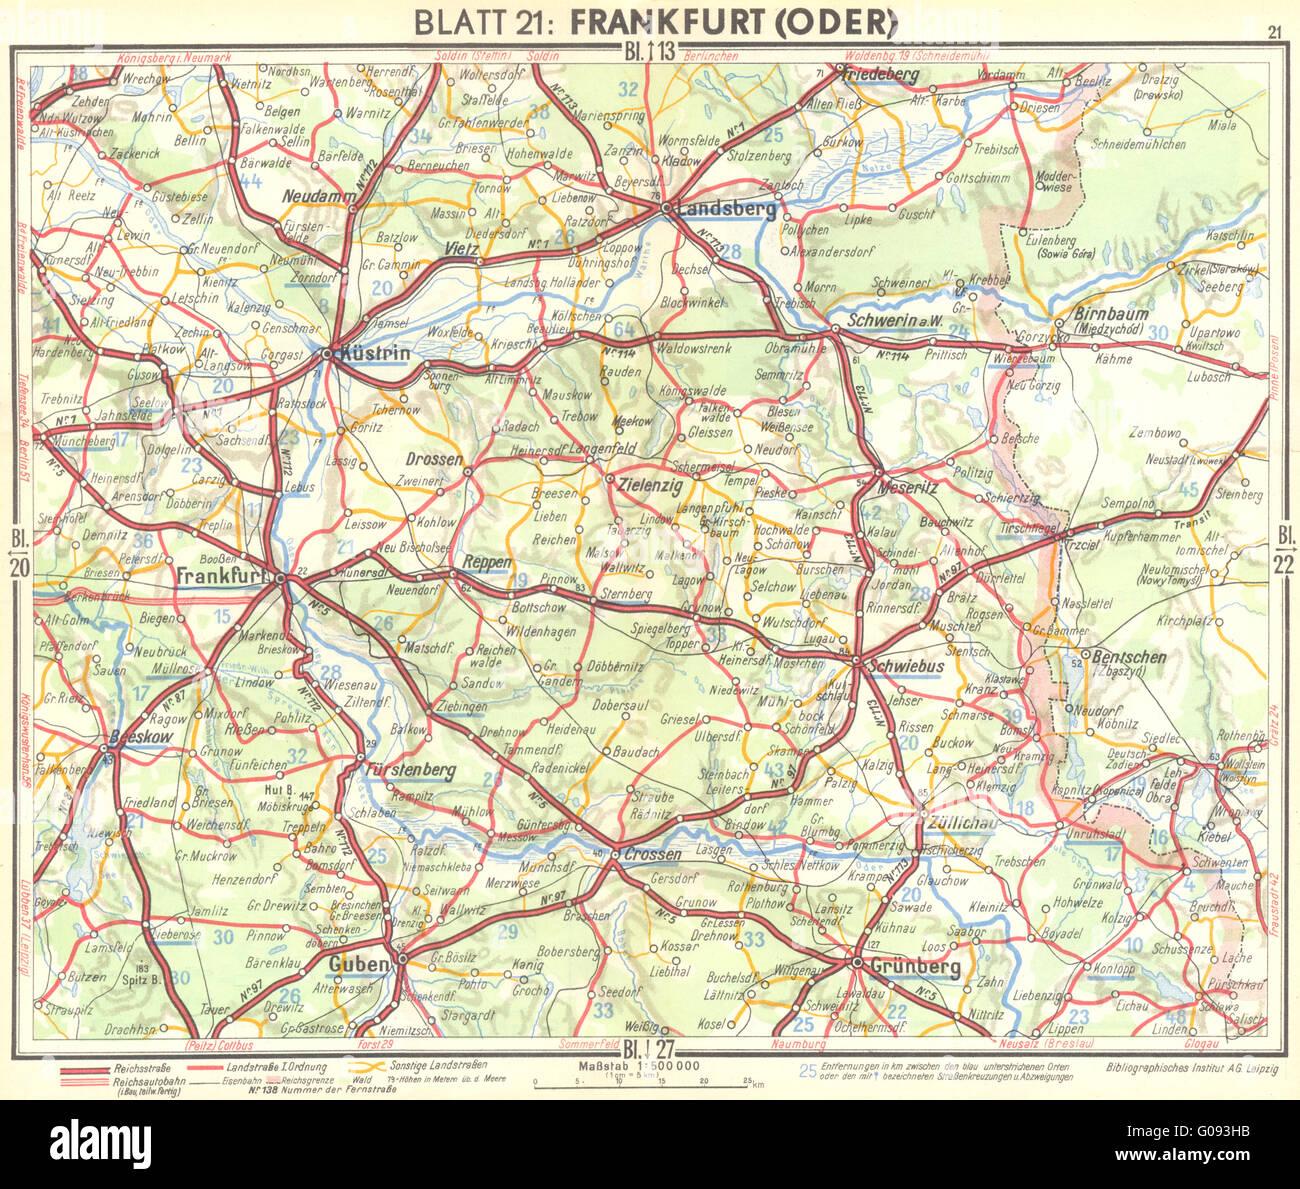 GERMANY: Frankfurt(Oder), 1936 vintage map Stock Photo: 103462615 ...